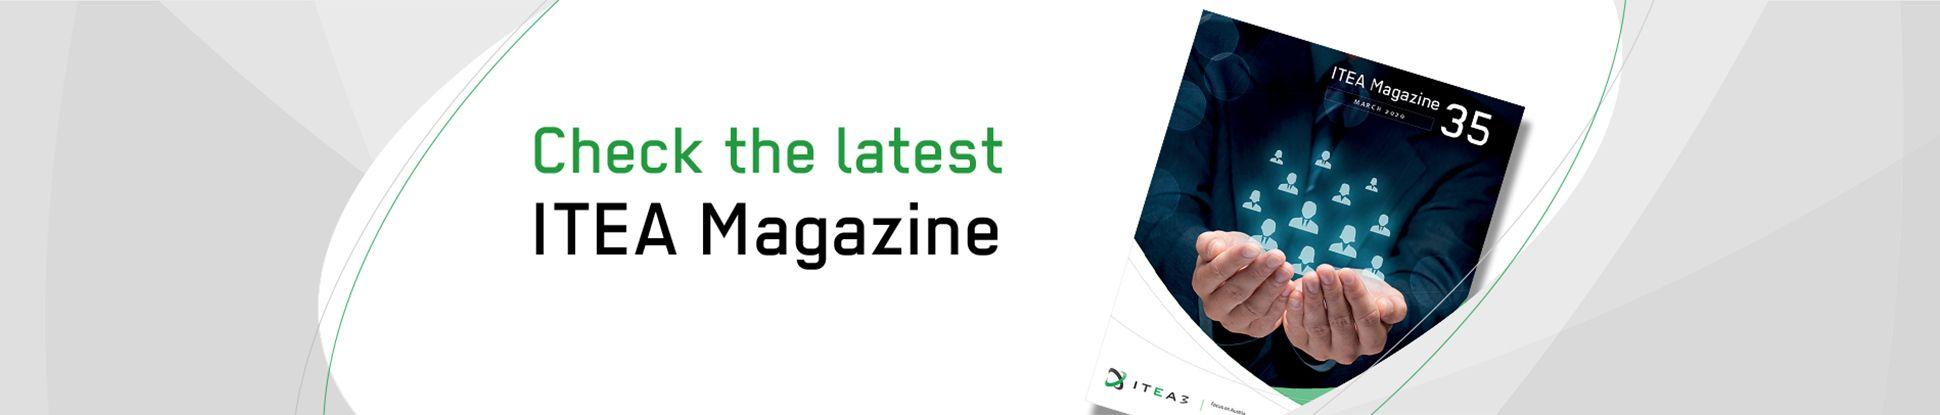 Check latest ITEA Magazine jumbotron.jpg